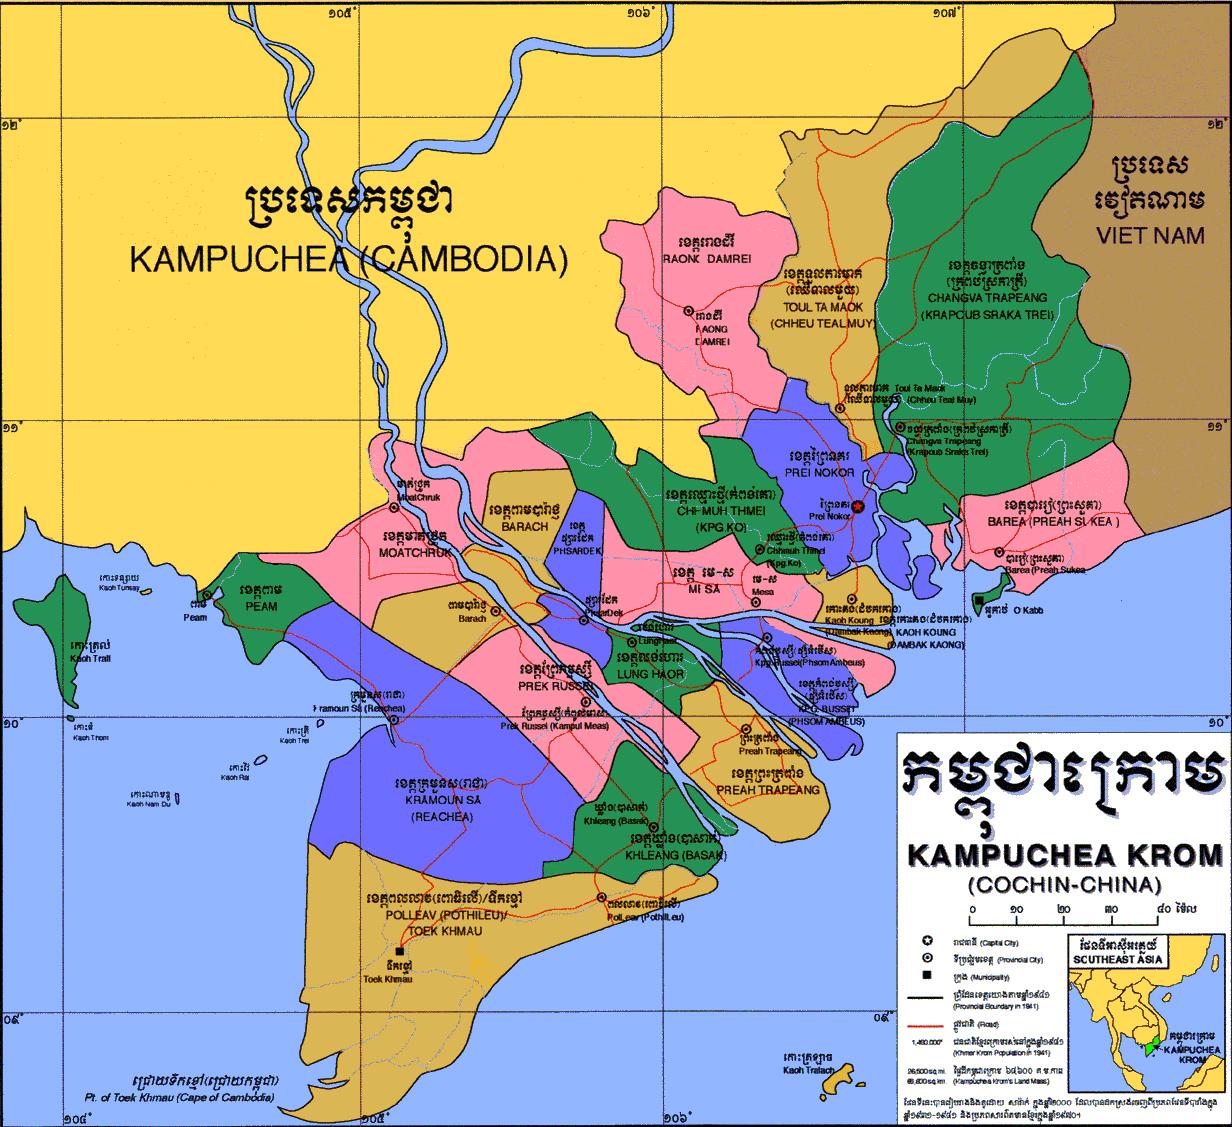 Liên Minh Người Khmer-Krom – Khmers Kampuchea-Krom Federation (KKF)